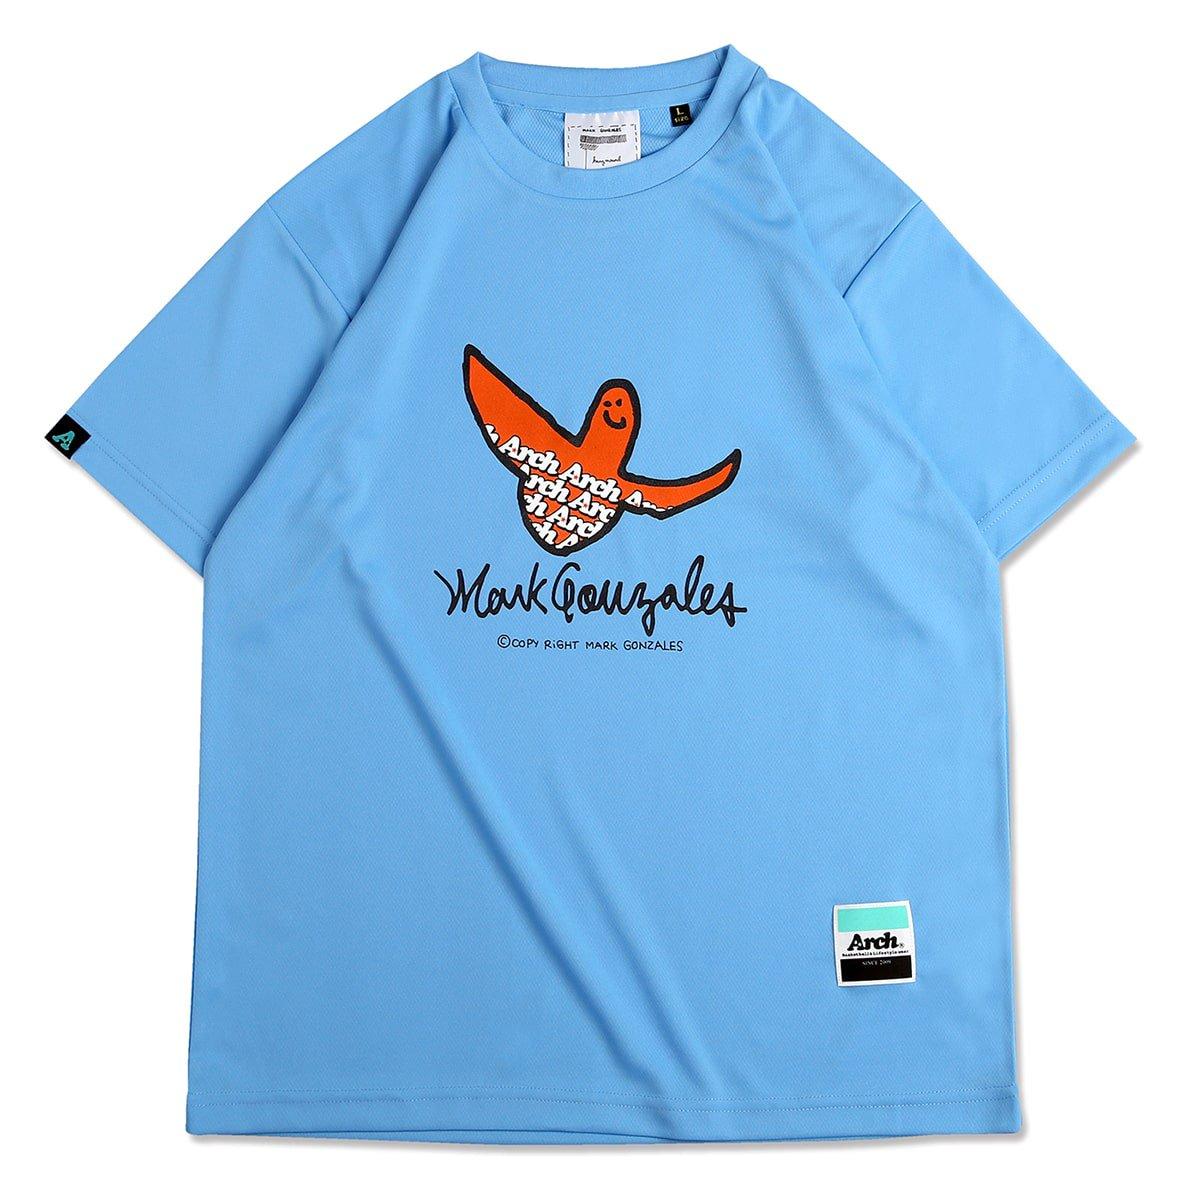 Mark Gonzales x Arch logo tee [DRY]【sax blue】